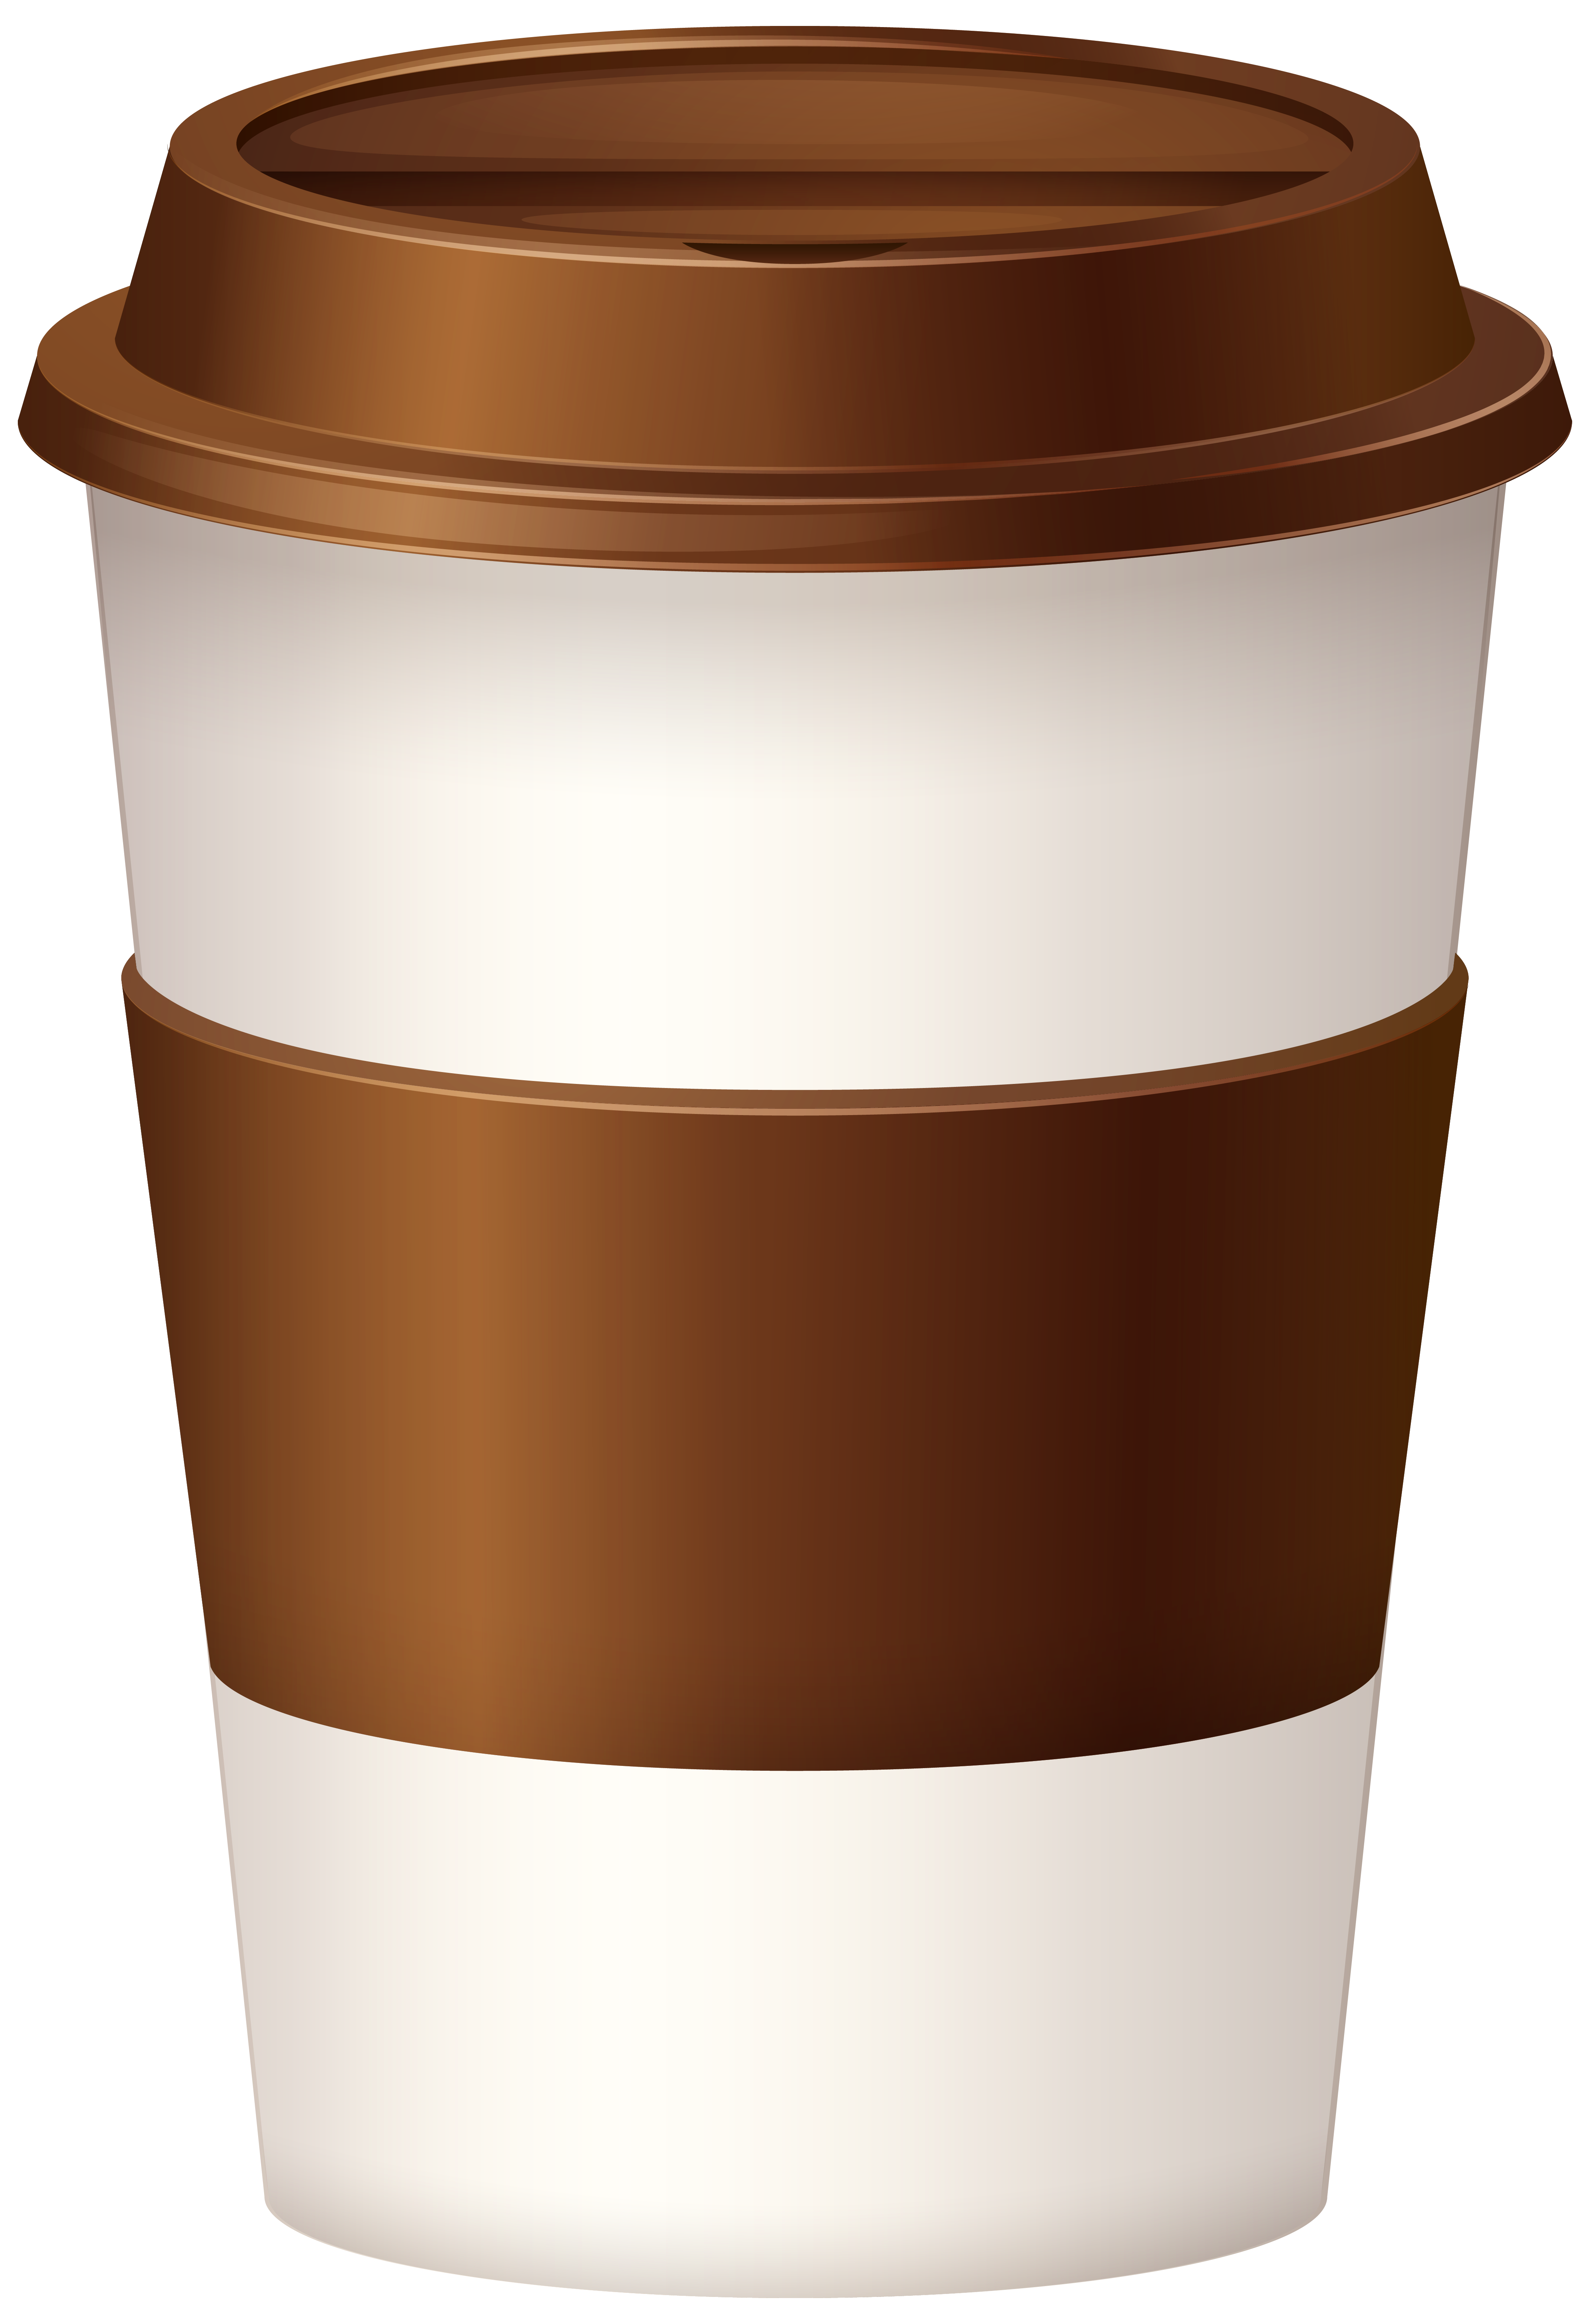 Mug clipart full cup Clip 3  clipart clipart